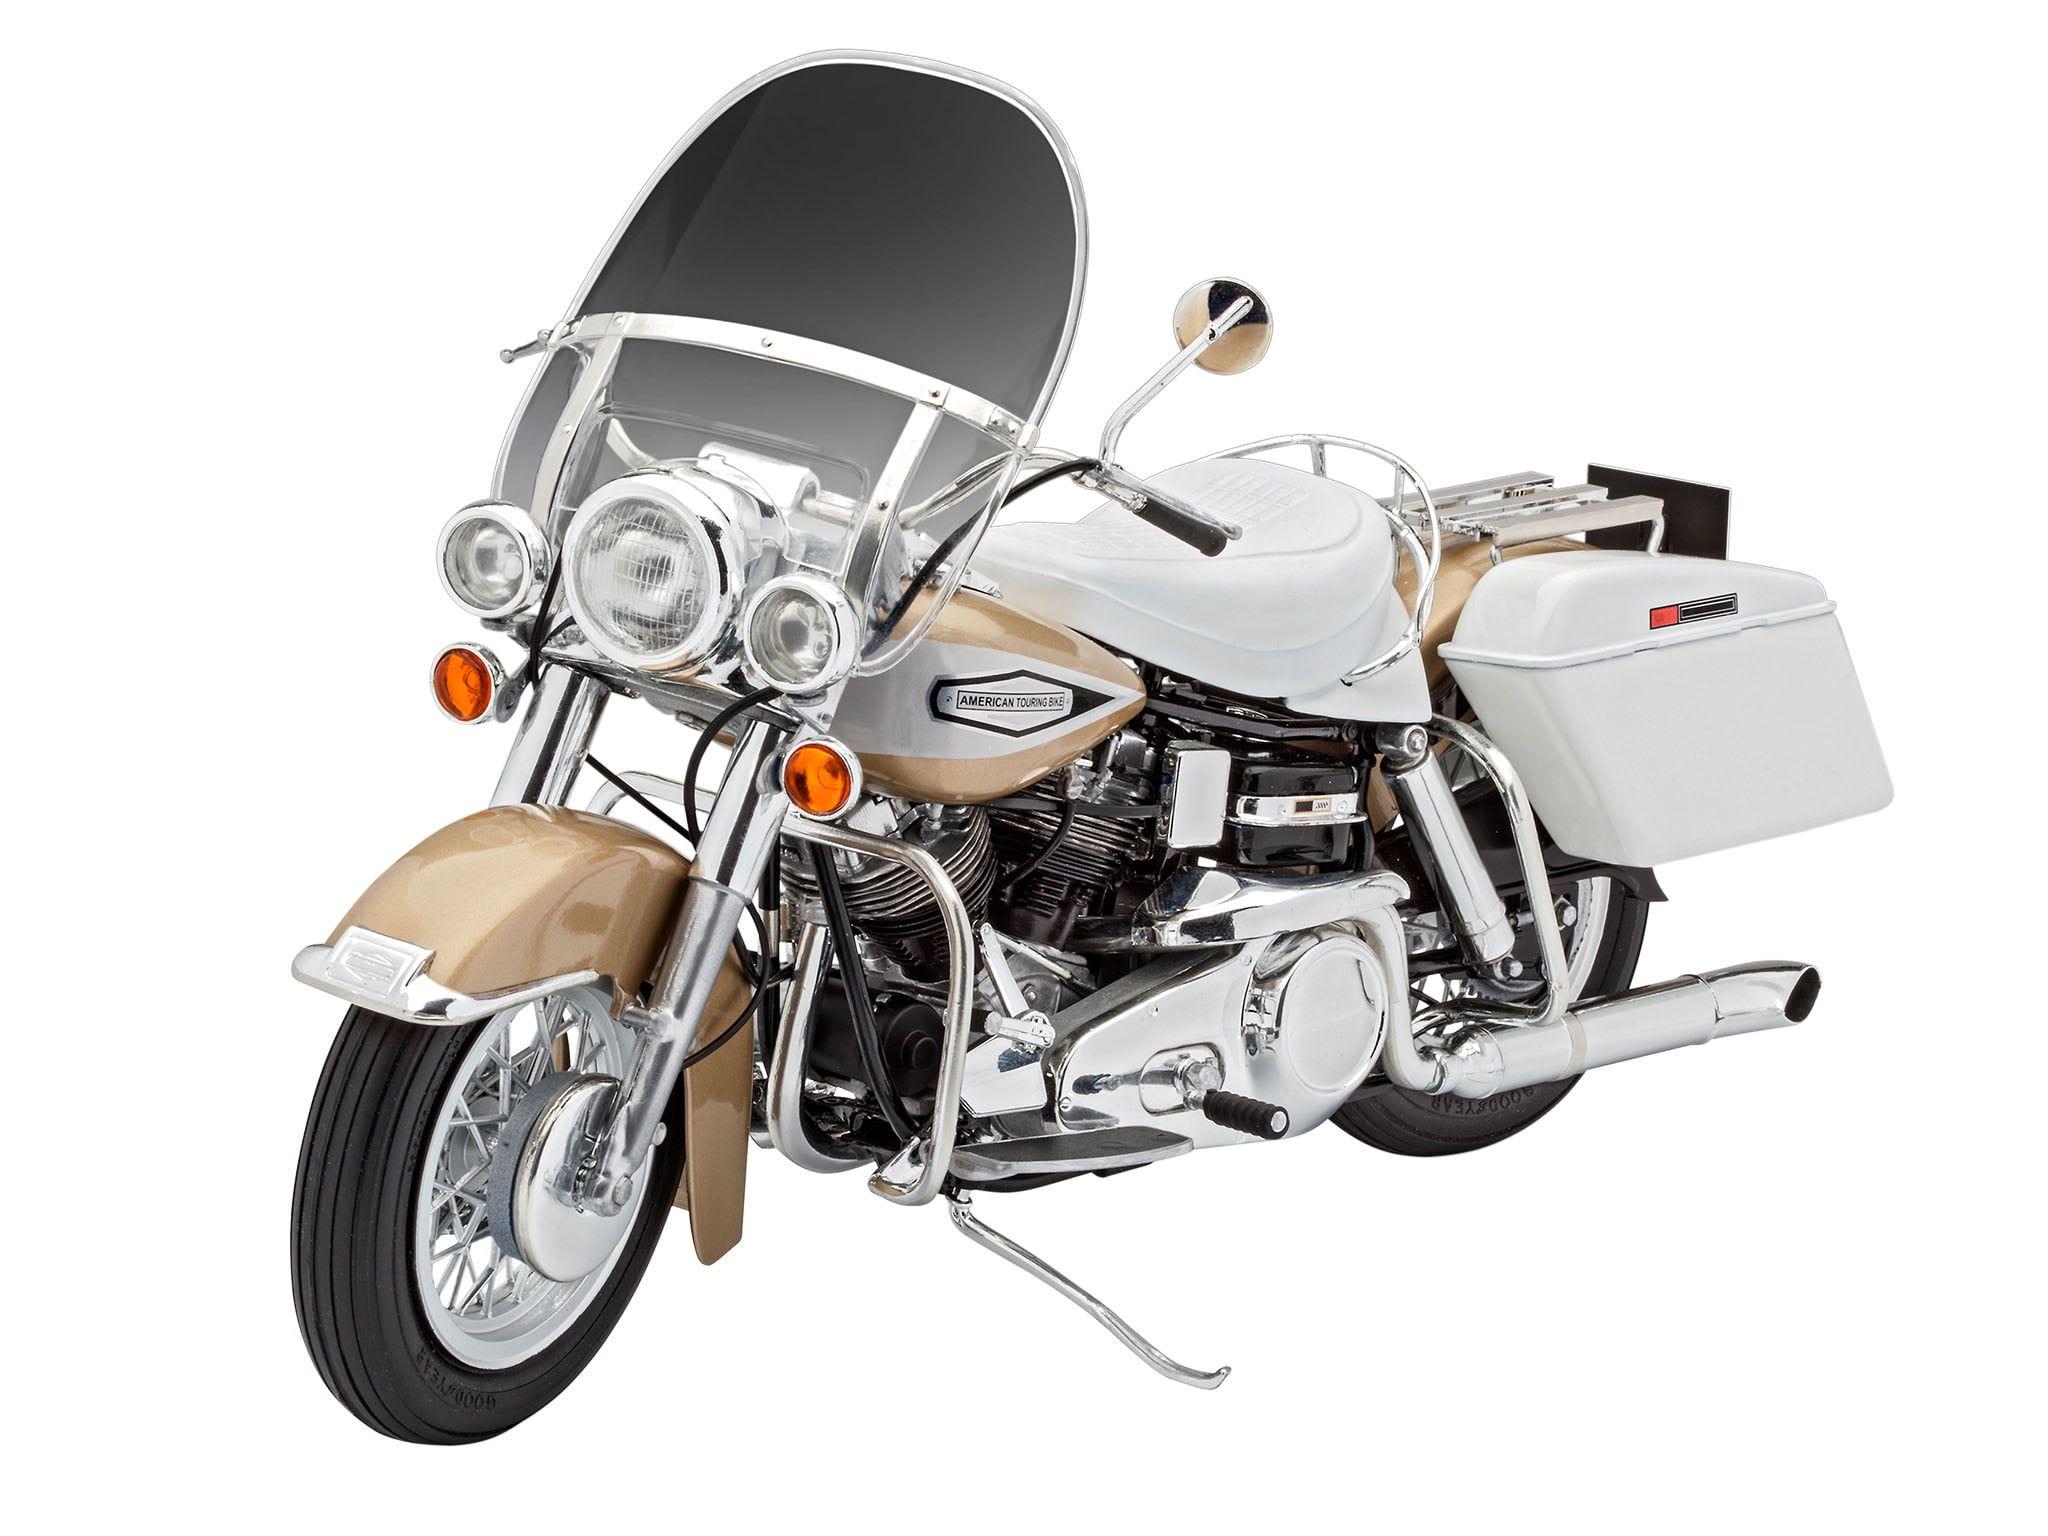 Revell US Touring Bike Kit